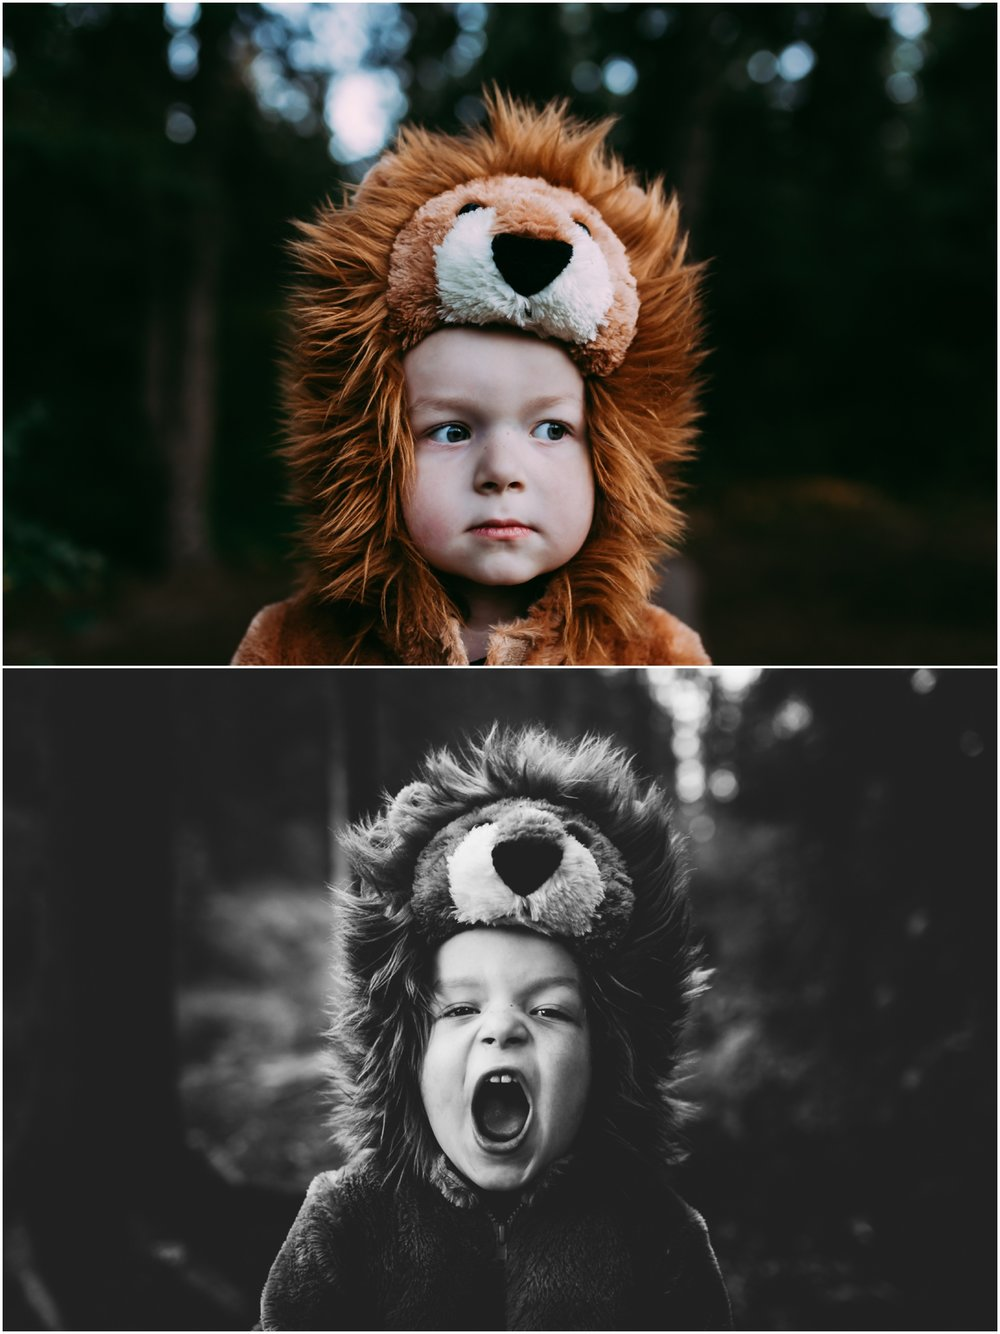 Edmonton Family Photographer - Best of 2016 - Halloween - Whitemud Ravine - Lion Costume - YEG